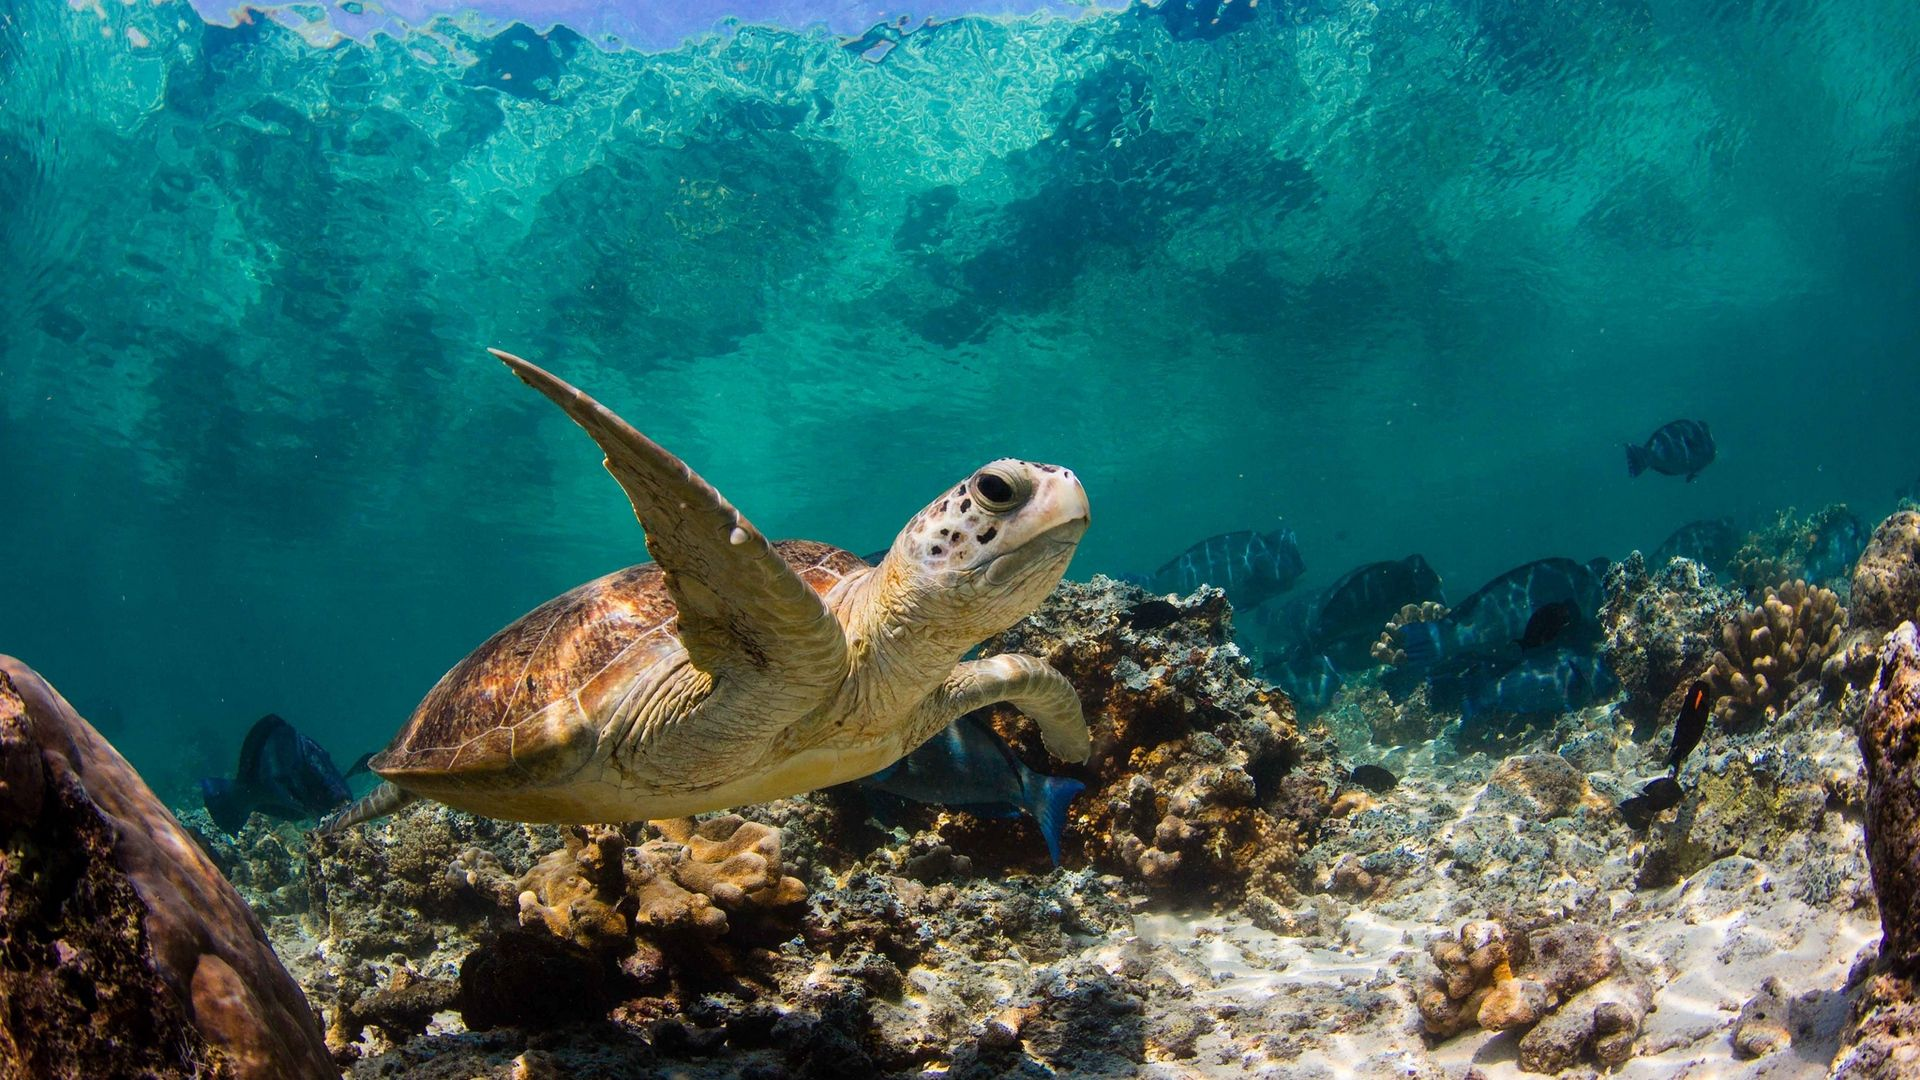 Turtle In Ocean Wallpaper